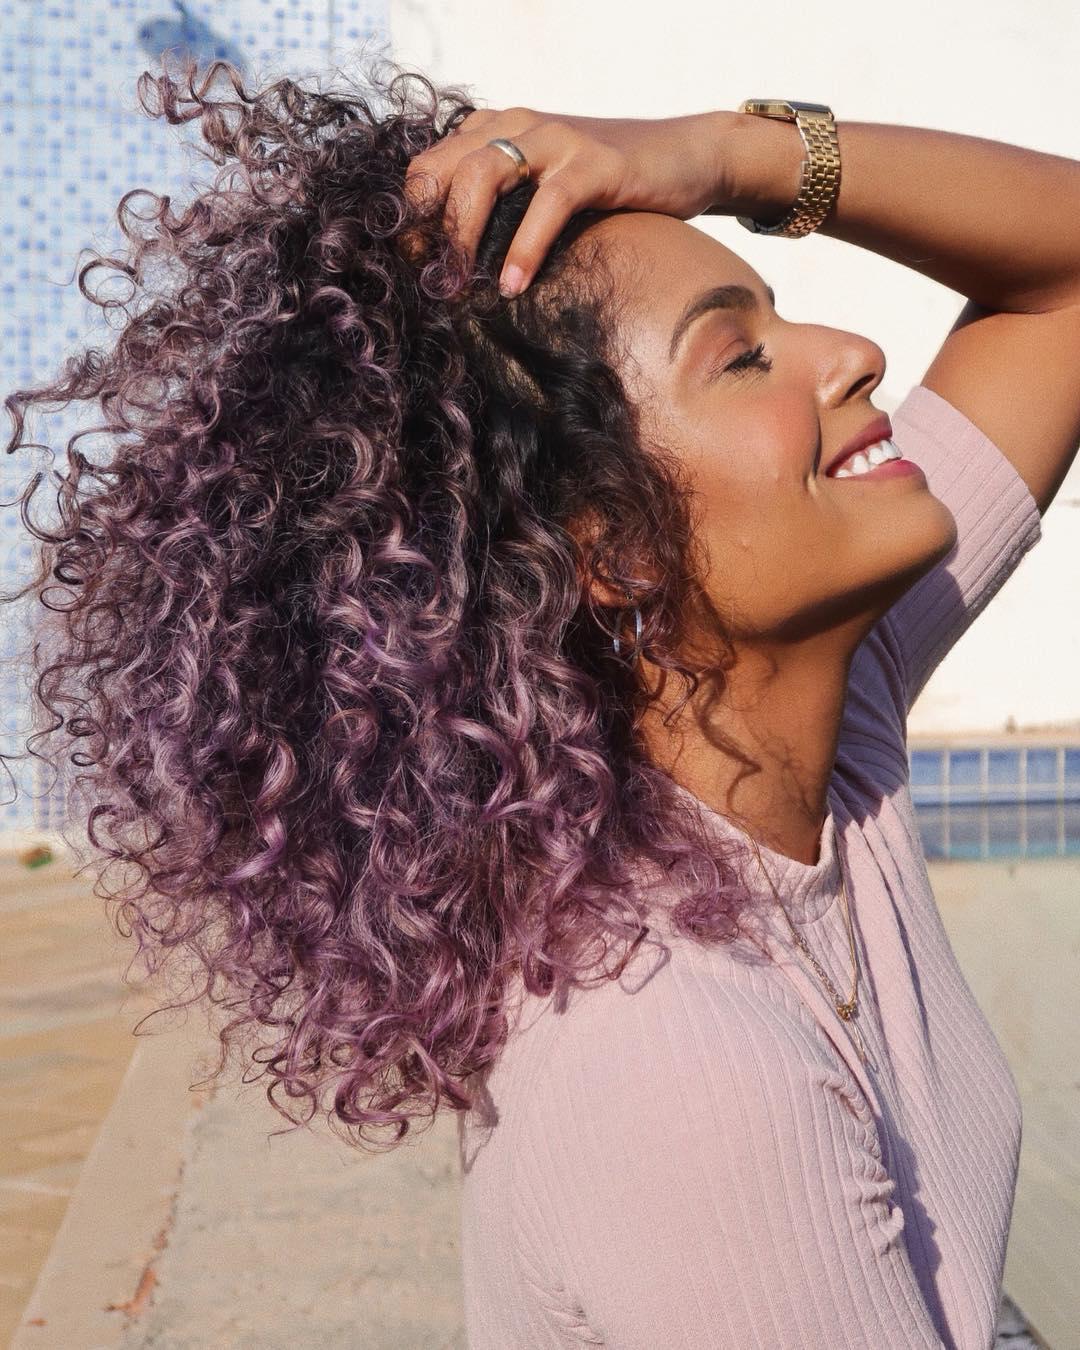 cabelo roxo 61